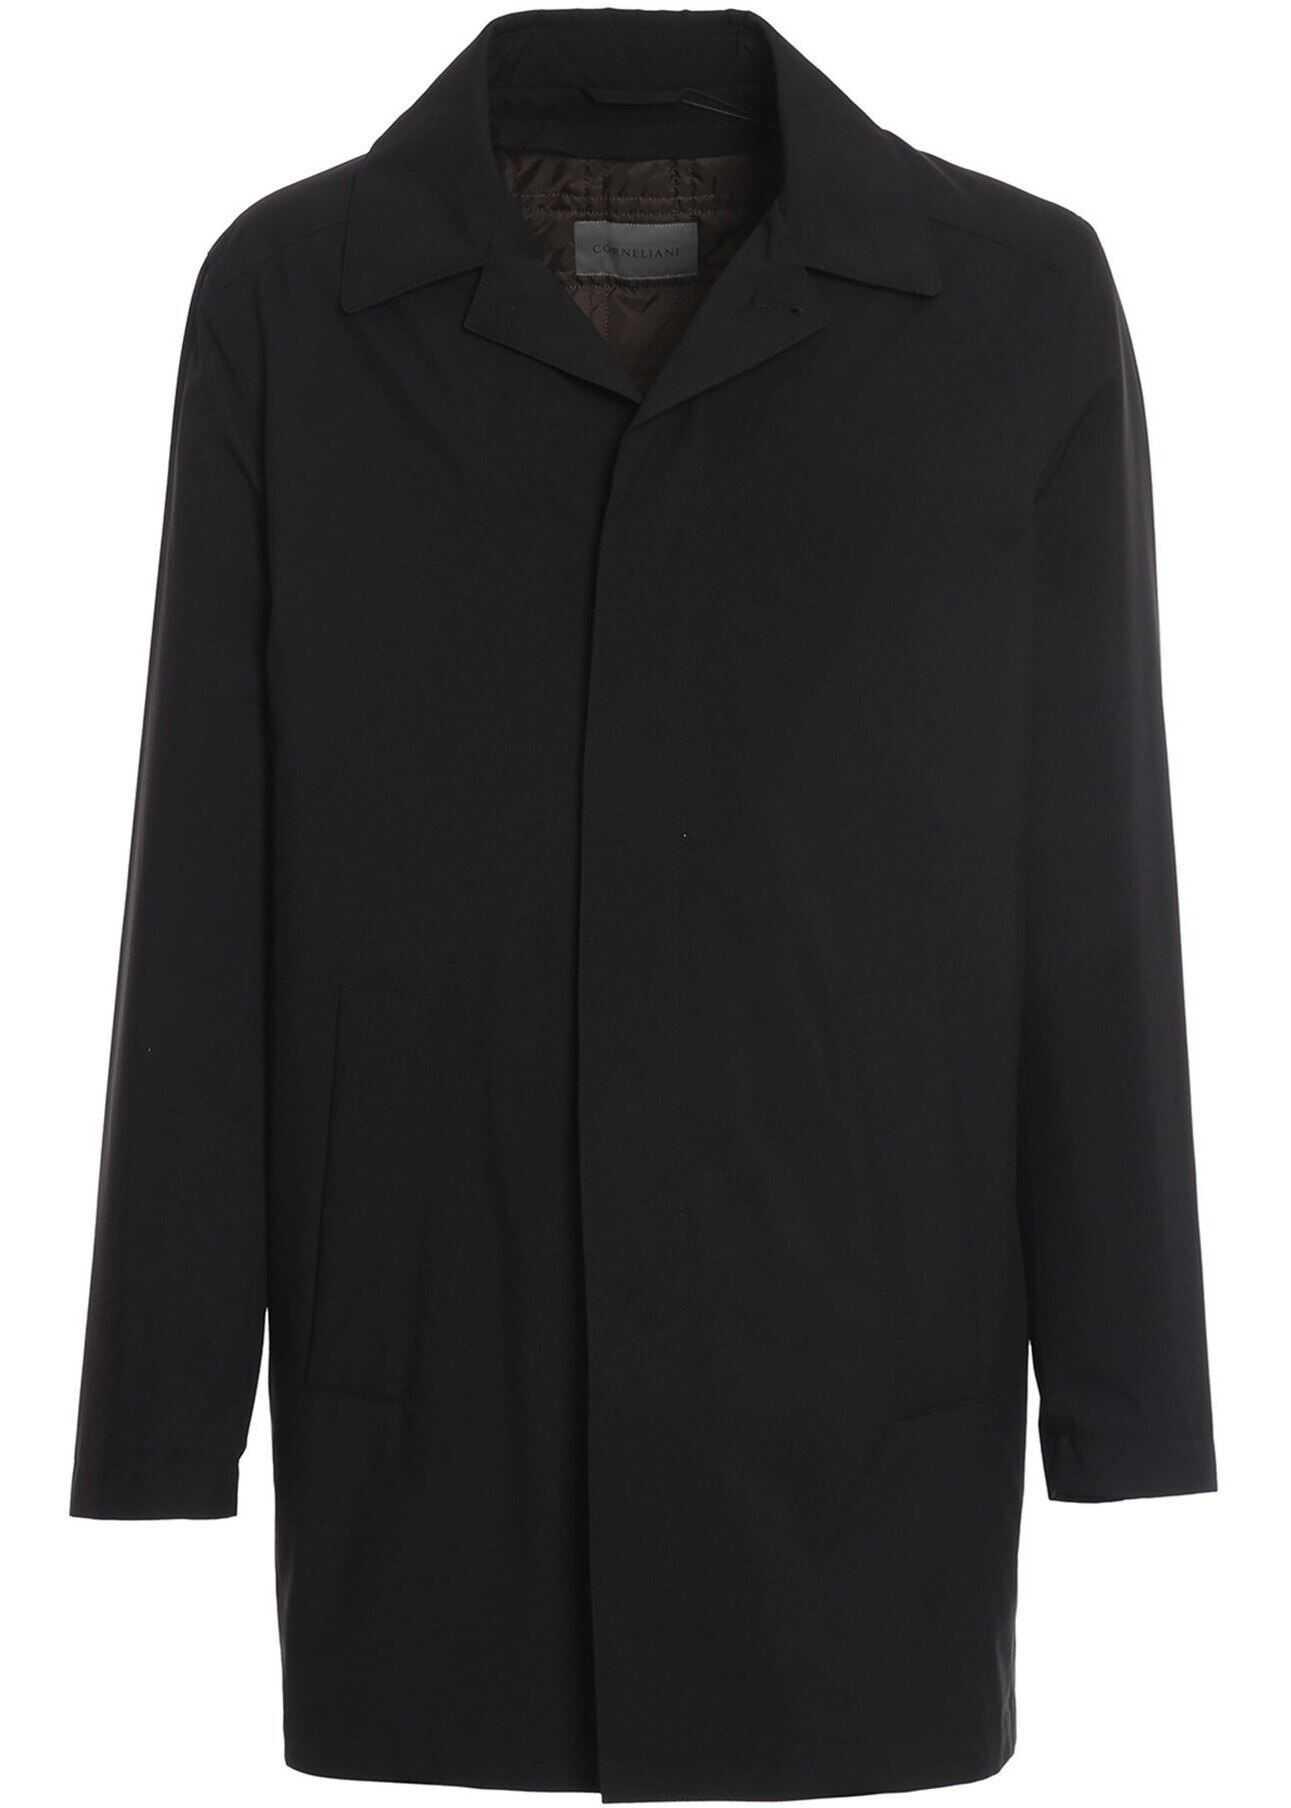 CORNELIANI Tech Fabric Raincoat Black imagine